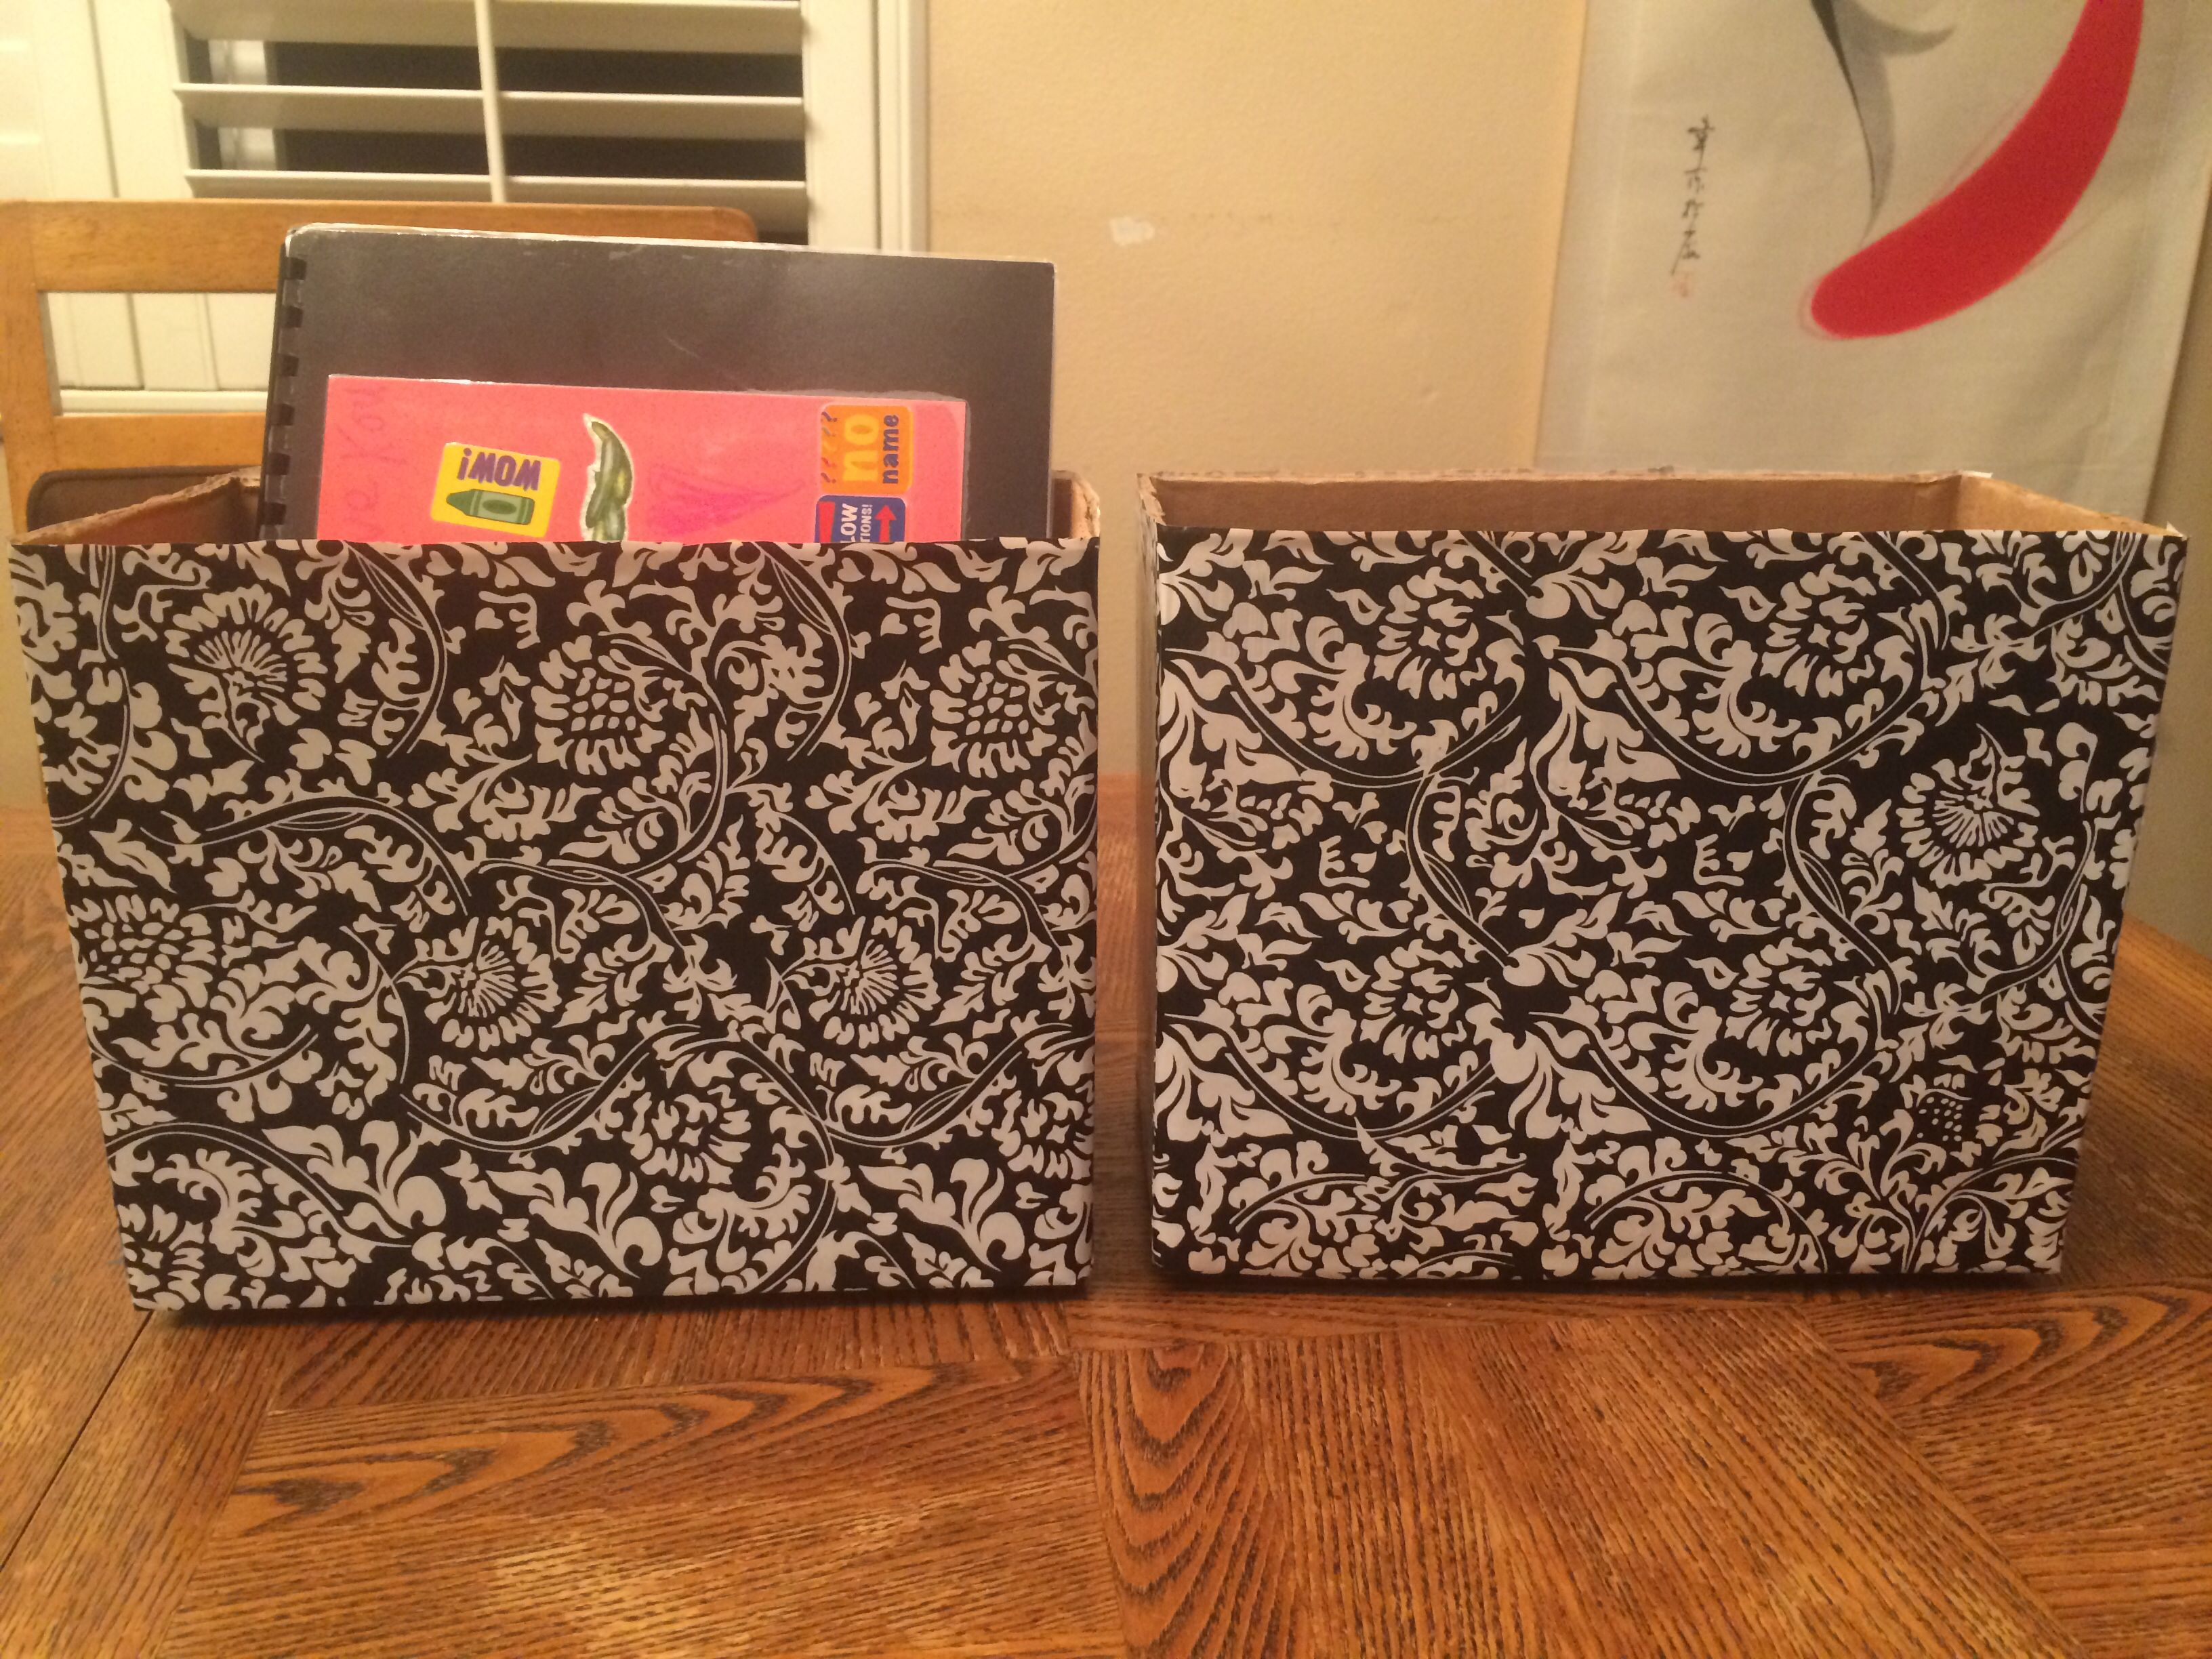 Cardboard Magazine Holders Cardboard Magazine Holders In Contact Paper Good For Speech Folders